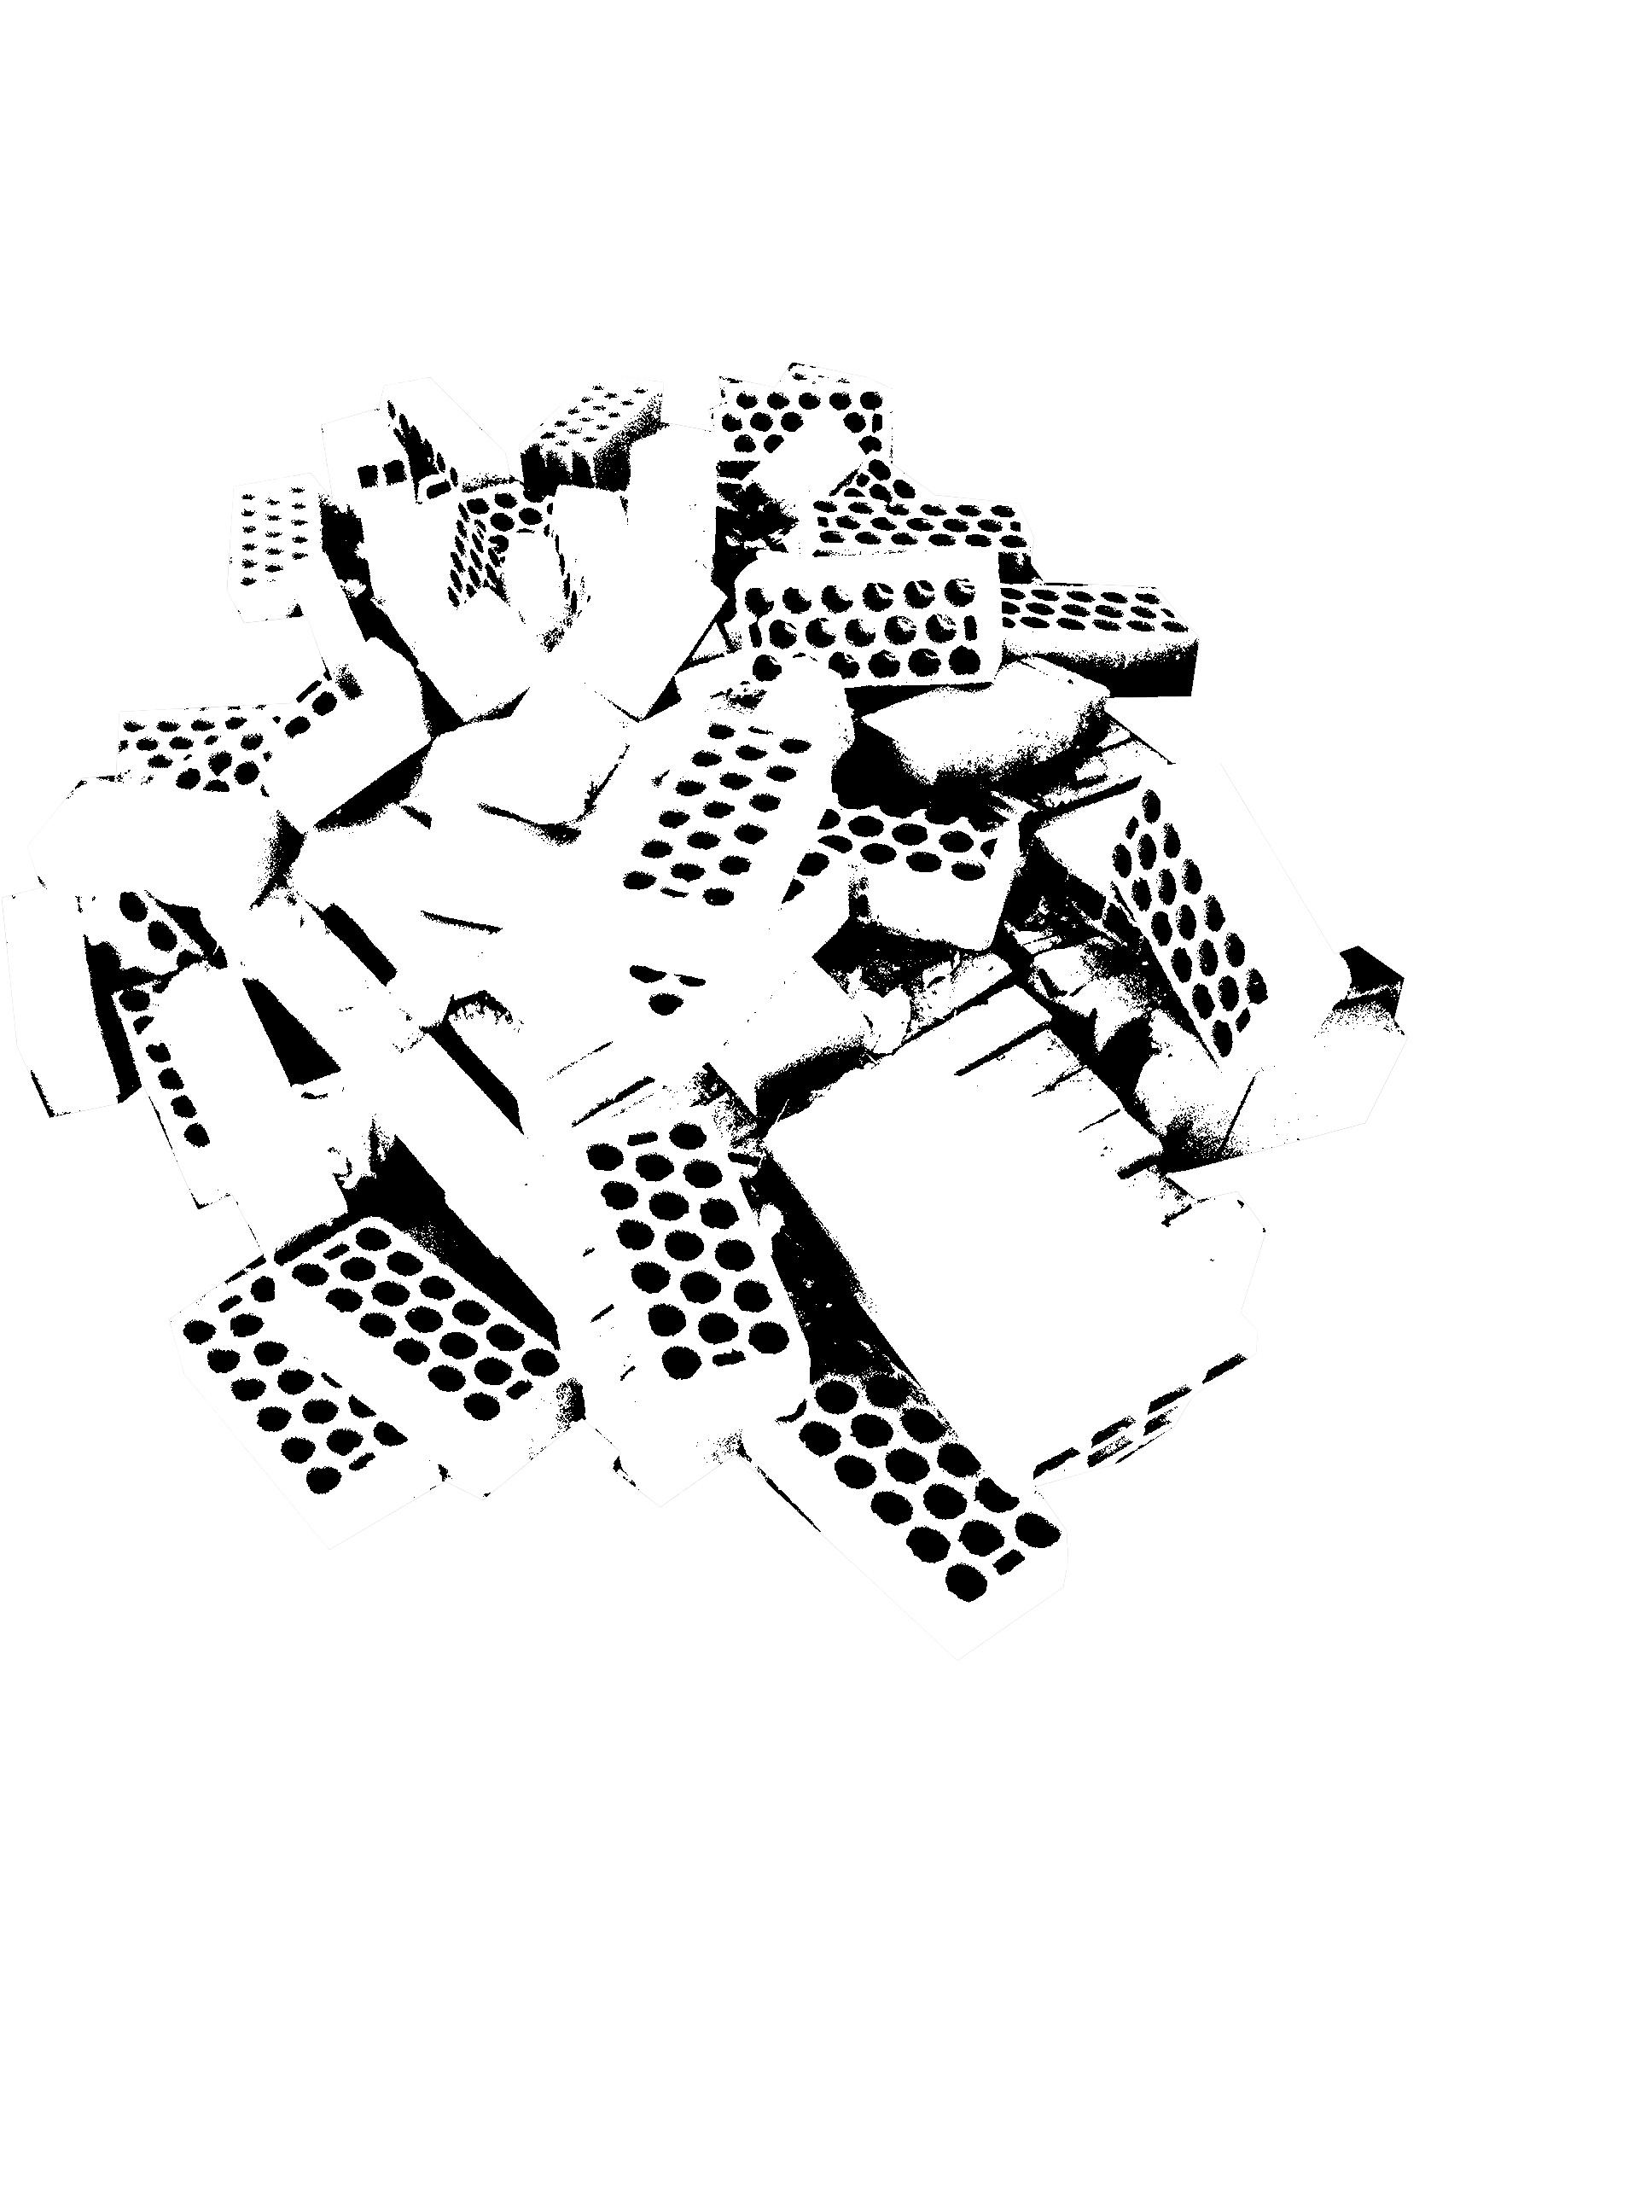 img/texturas/Foto 17-10-12 11 13 59.jpg